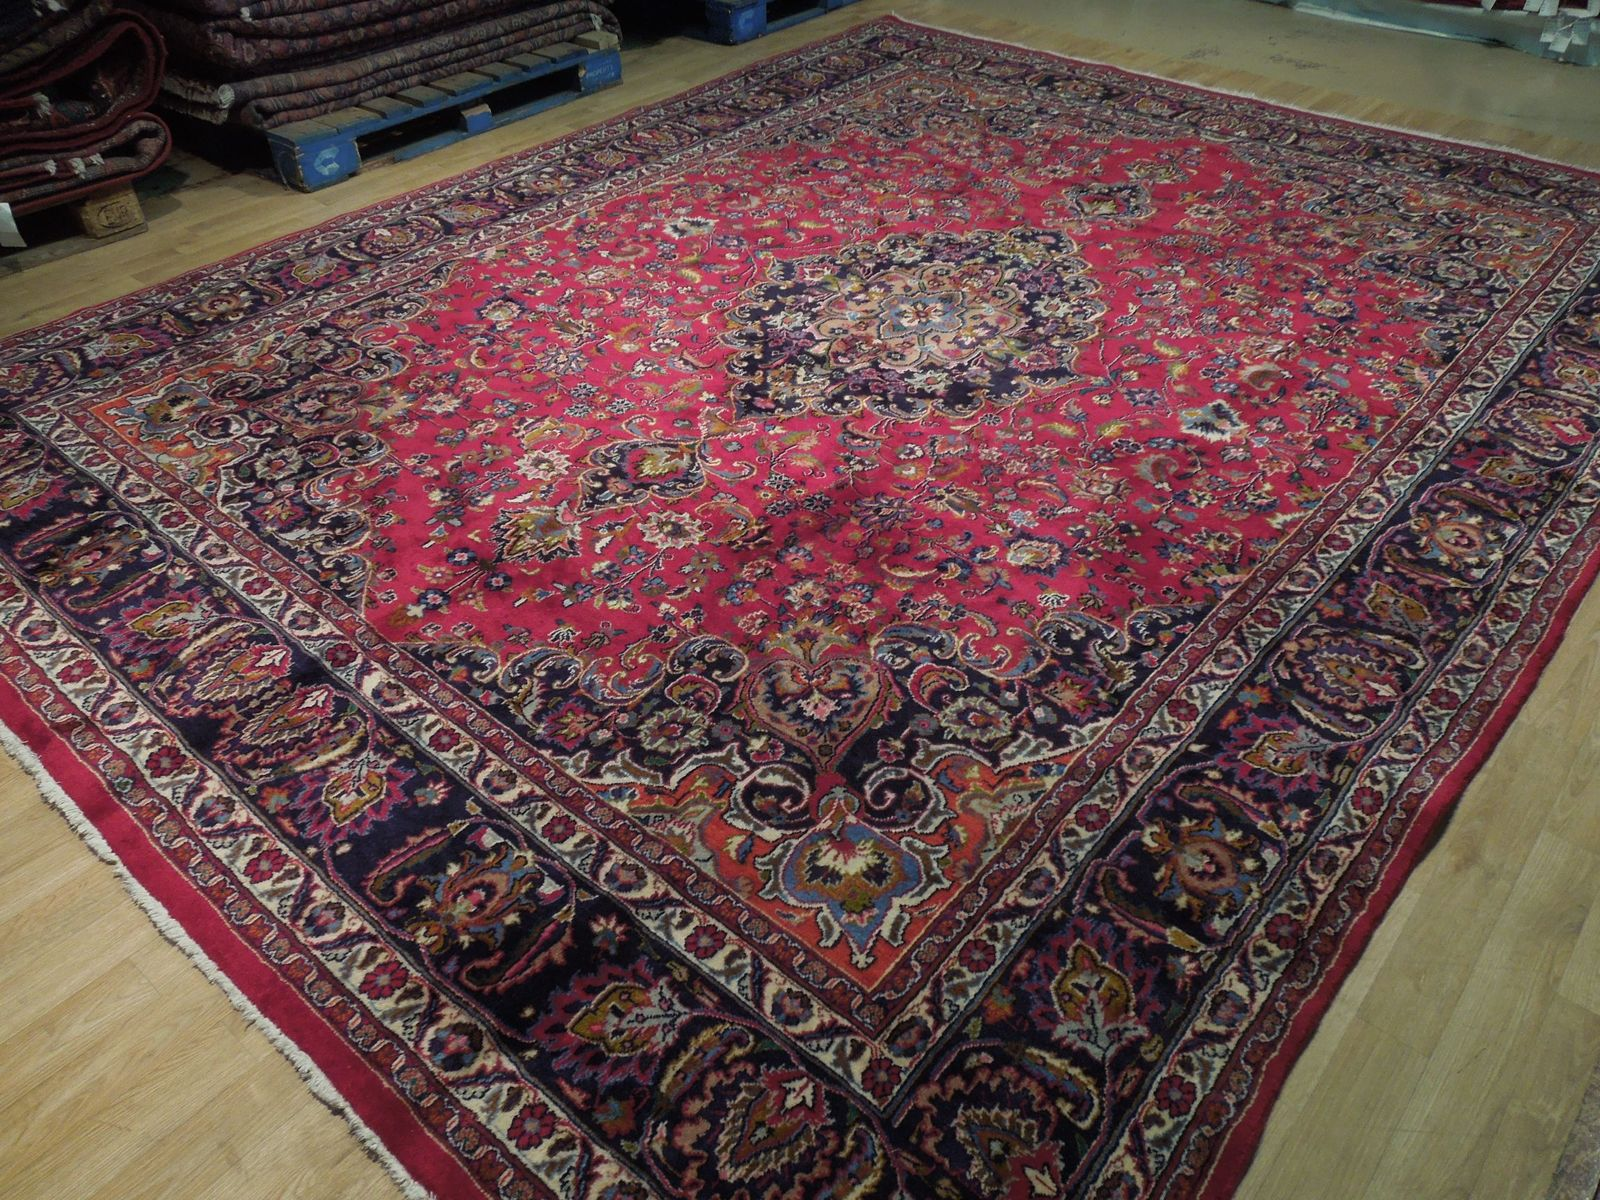 Red Wool Rug 10' x 12' Scarlet Vivid Original Traditional Persian Handmade Rug image 5